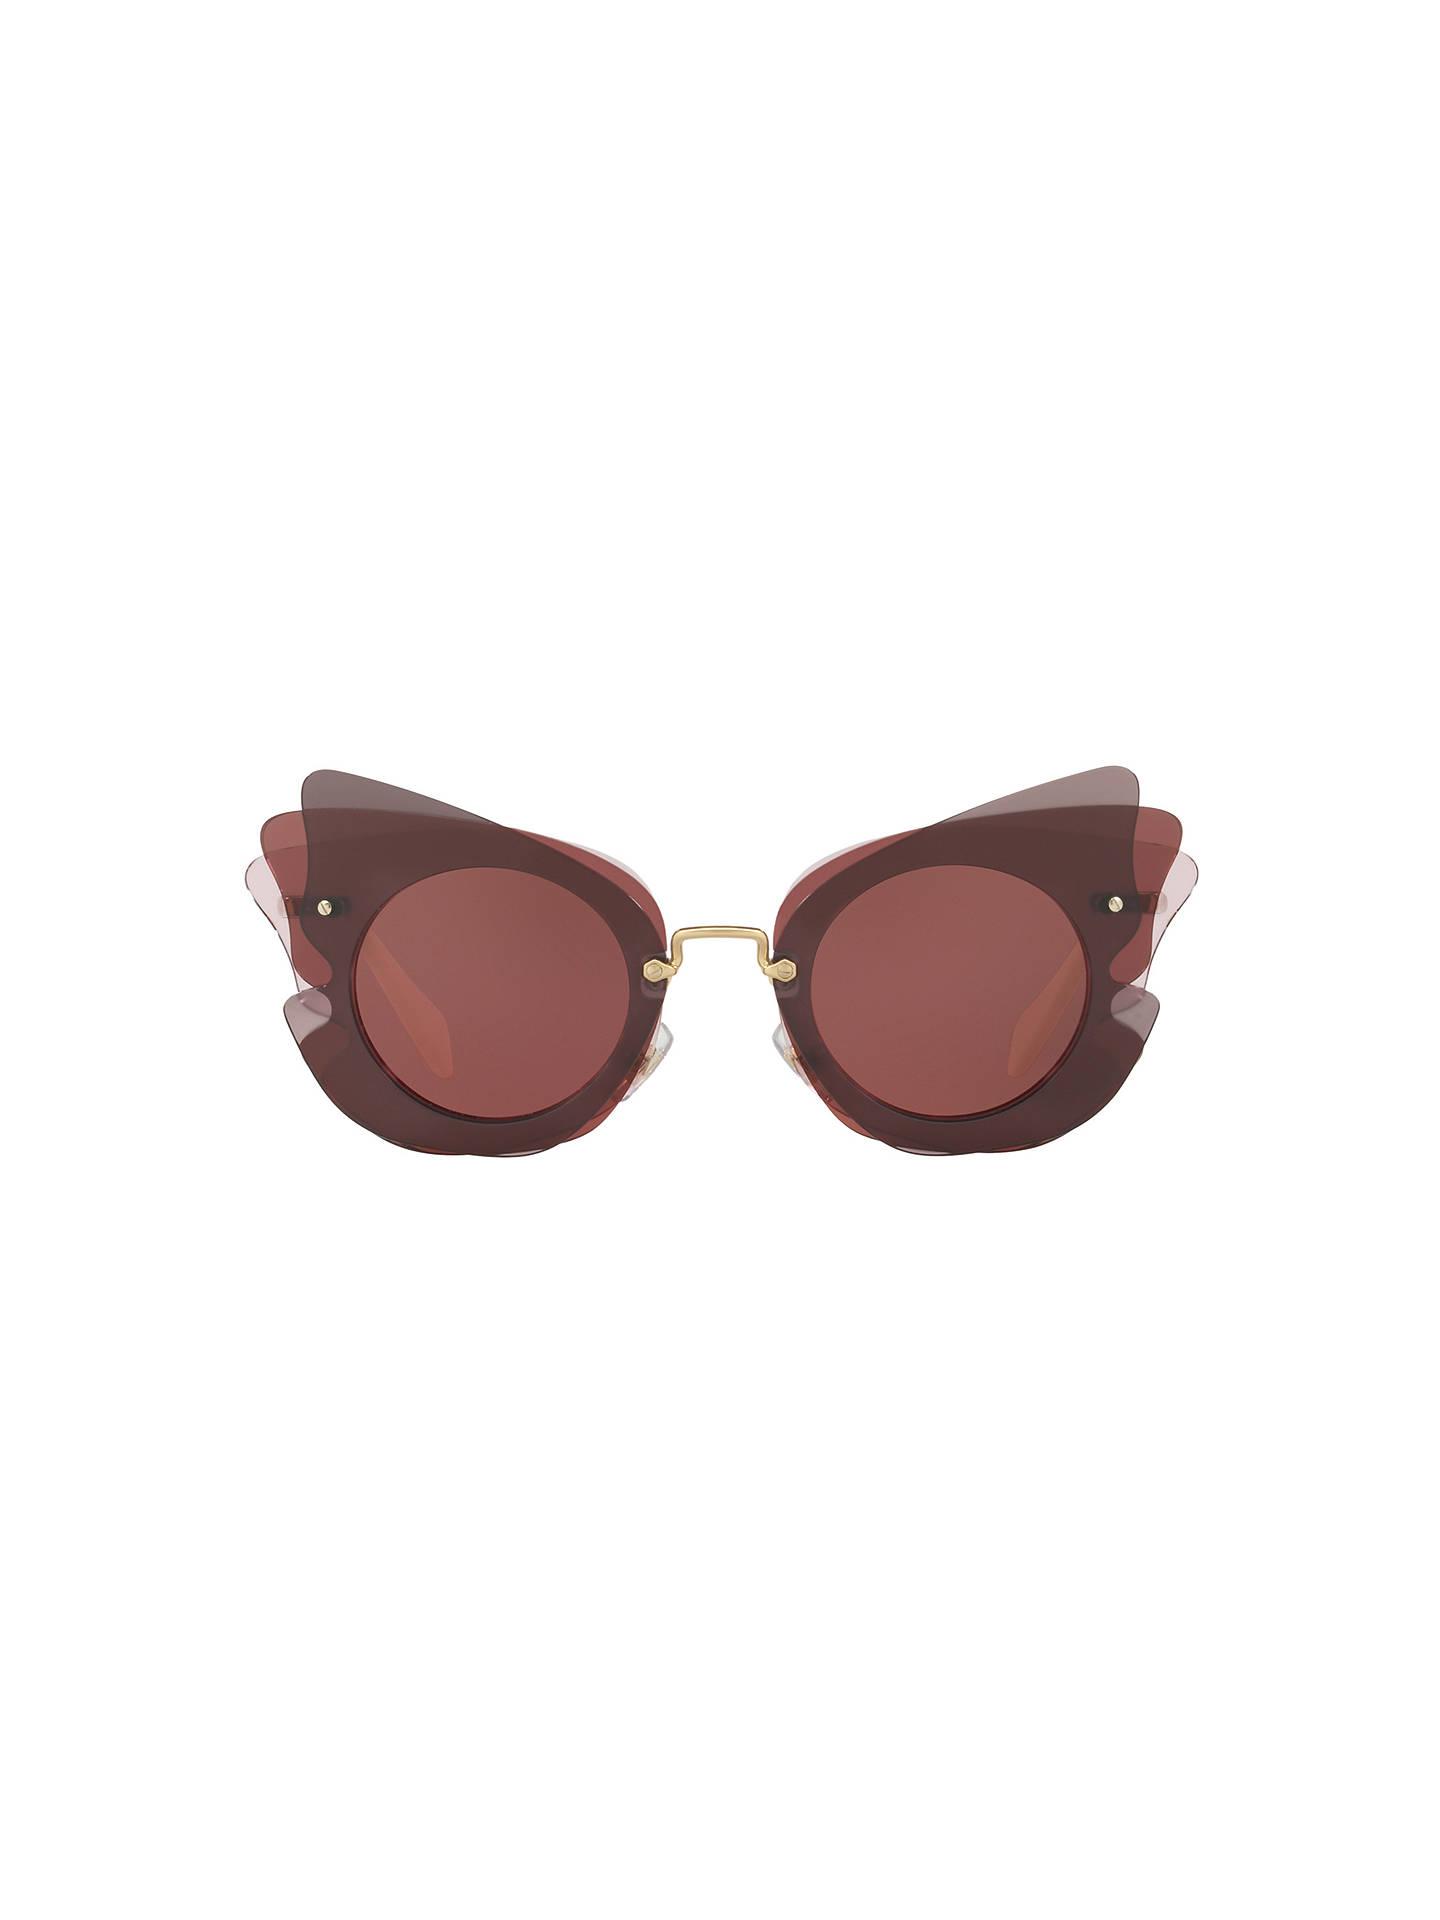 e428e0bb05d9 ... Buy Miu Miu MU 02SS Triple Butterfly Frame Sunglasses, Dark  Brown/Terracotta Online at ...